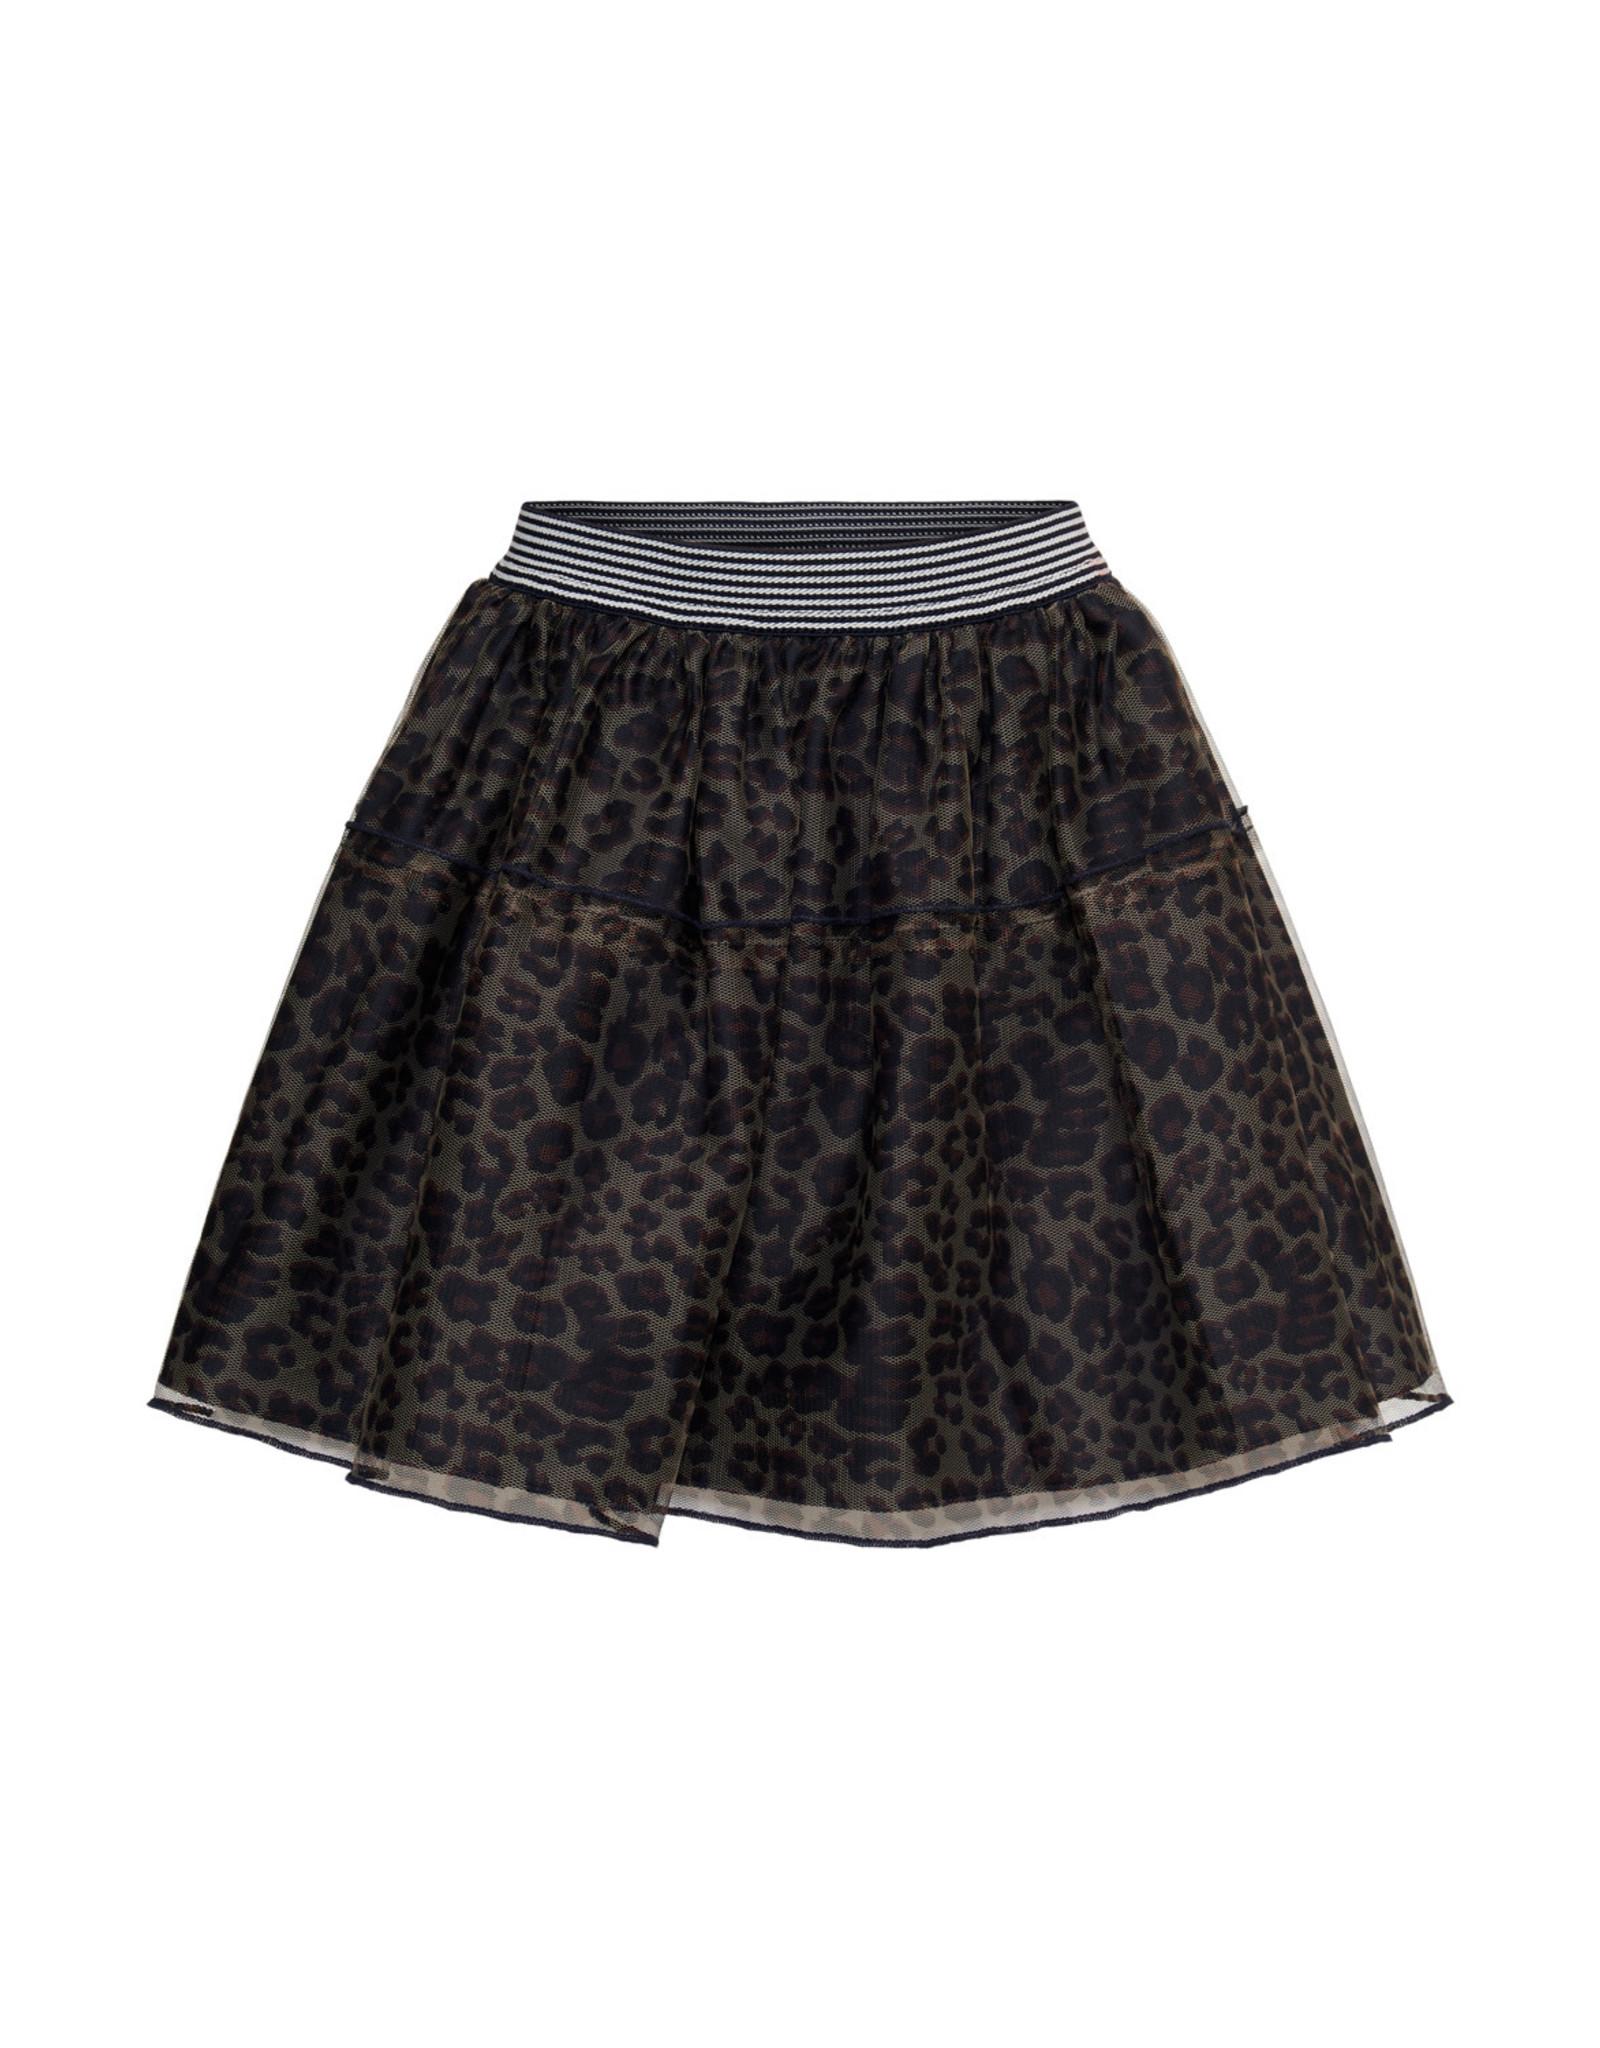 Topitm Mesh Skirt Carina AOP Animal